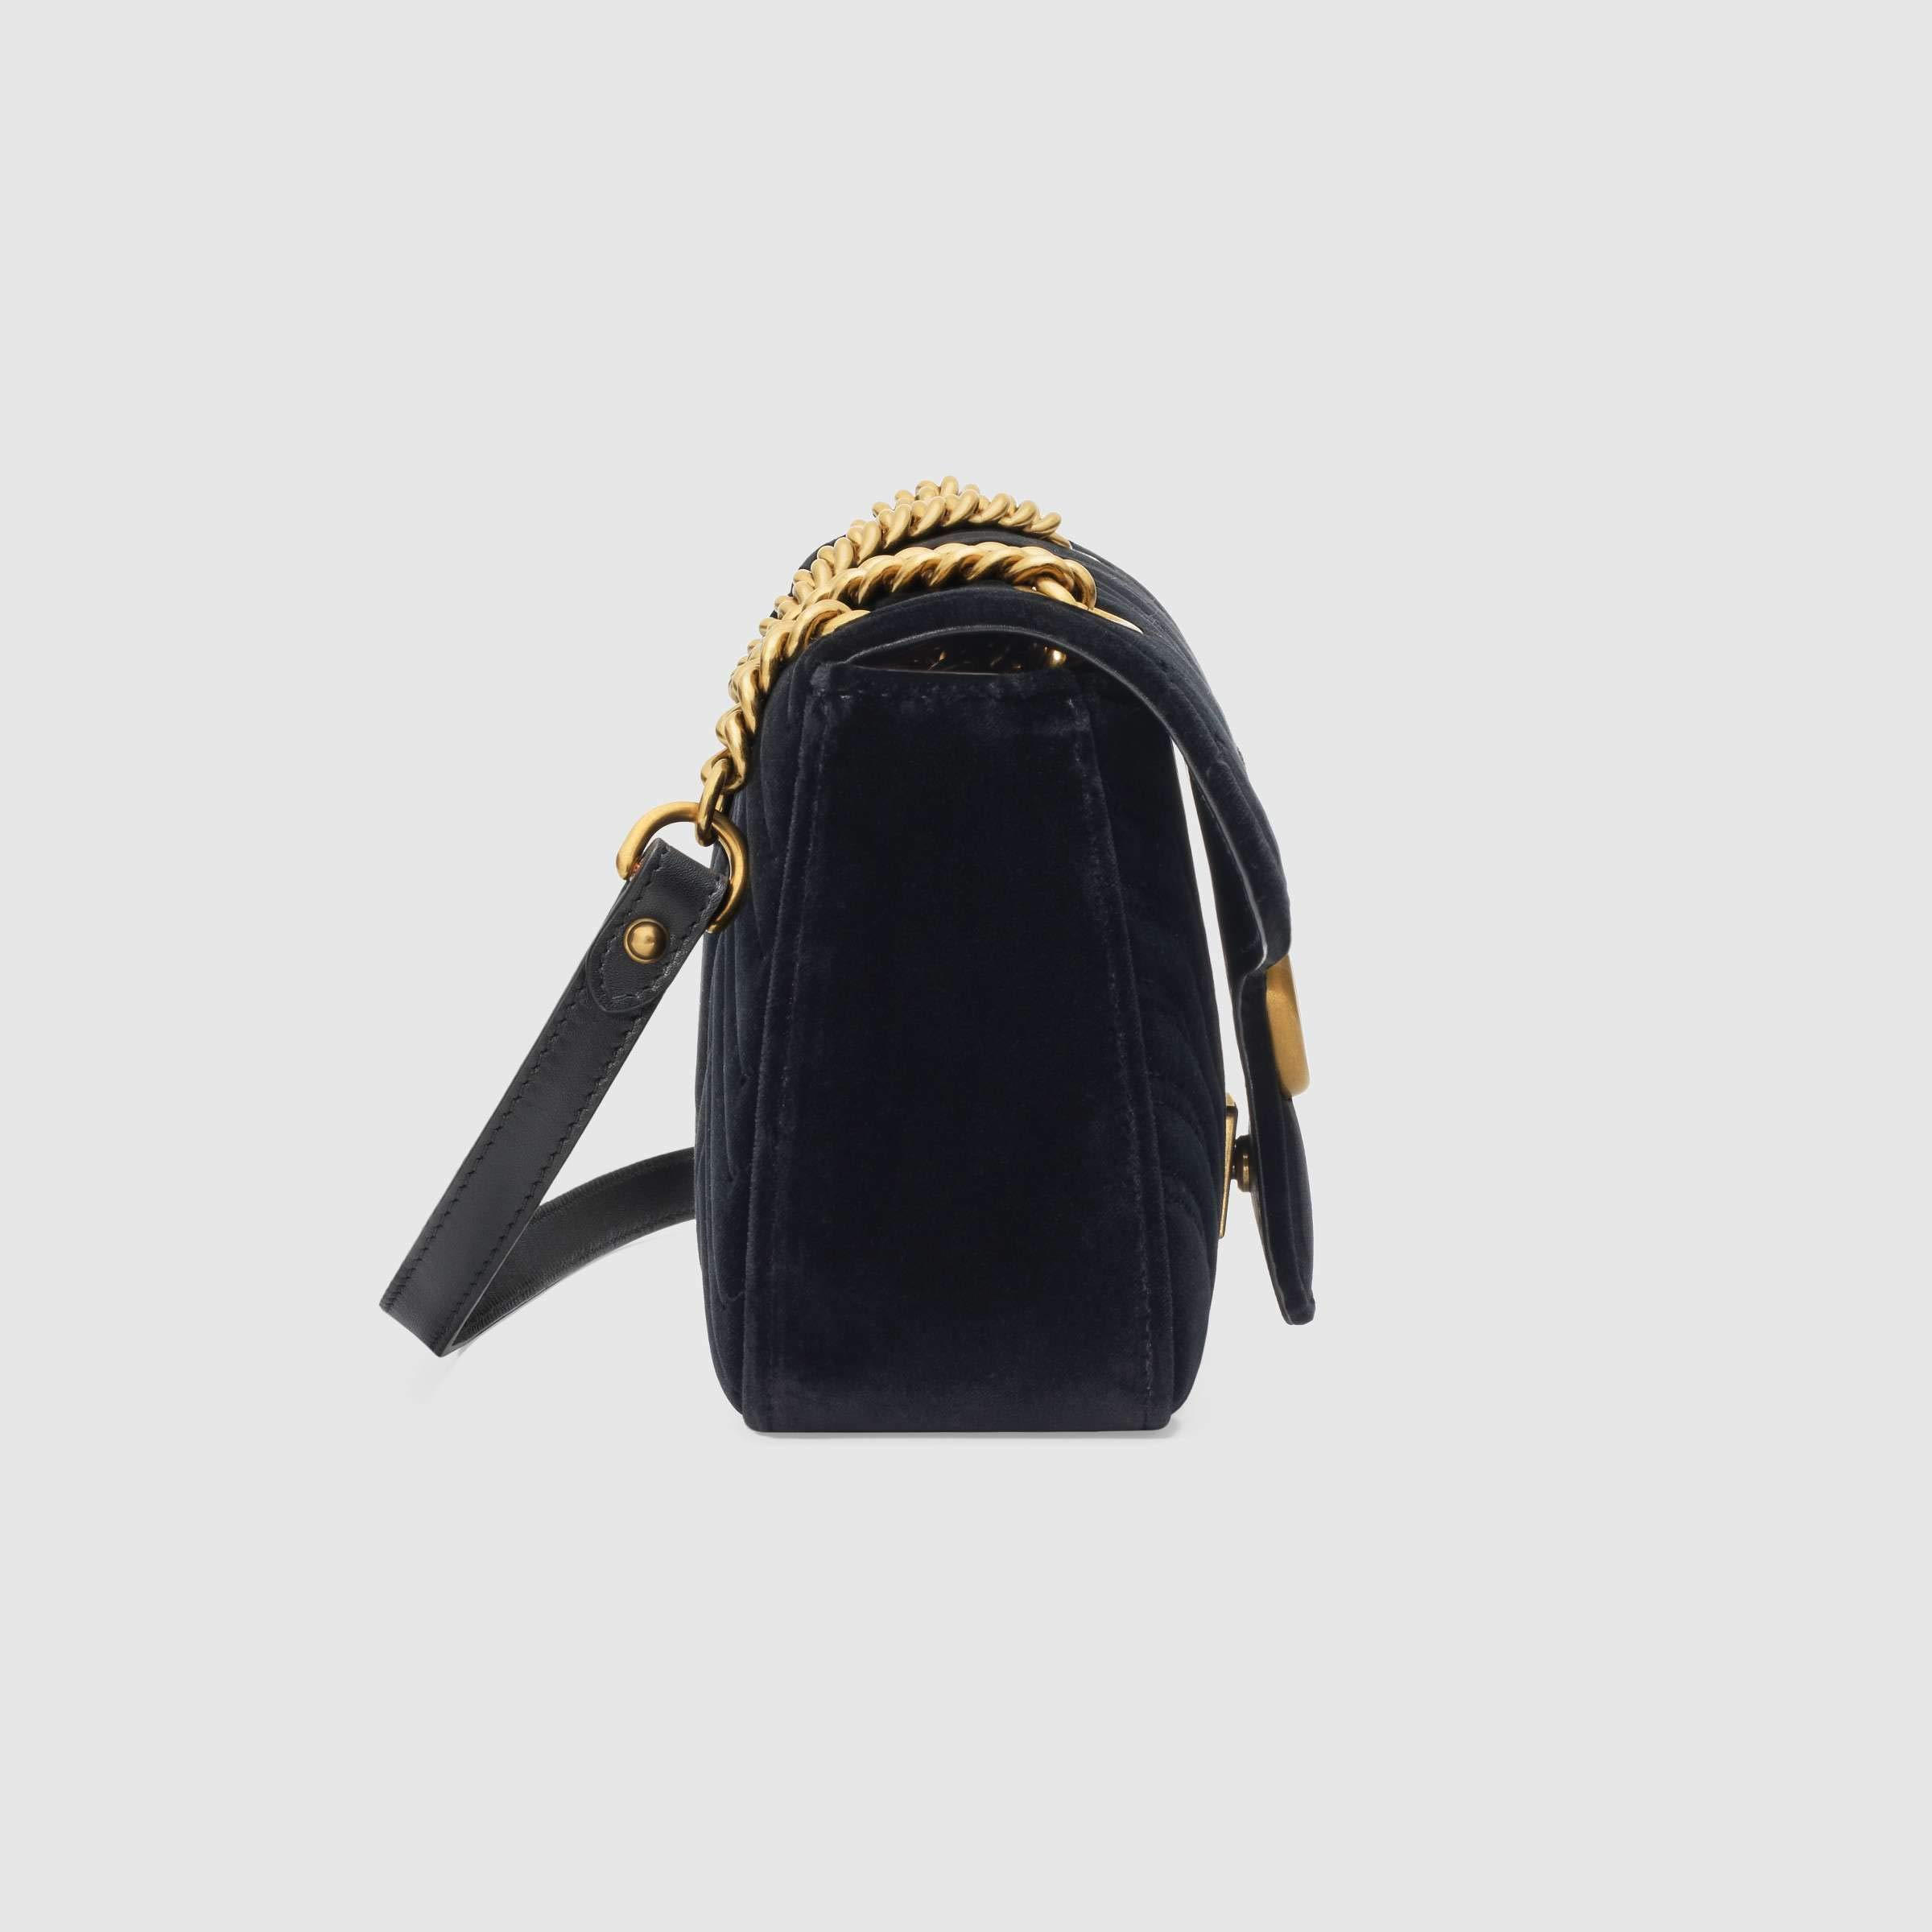 46d55d6d91 Merry-Gucci GG Marmont velvet shoulder bag – STUNNING TRENDY HANDBAGS!